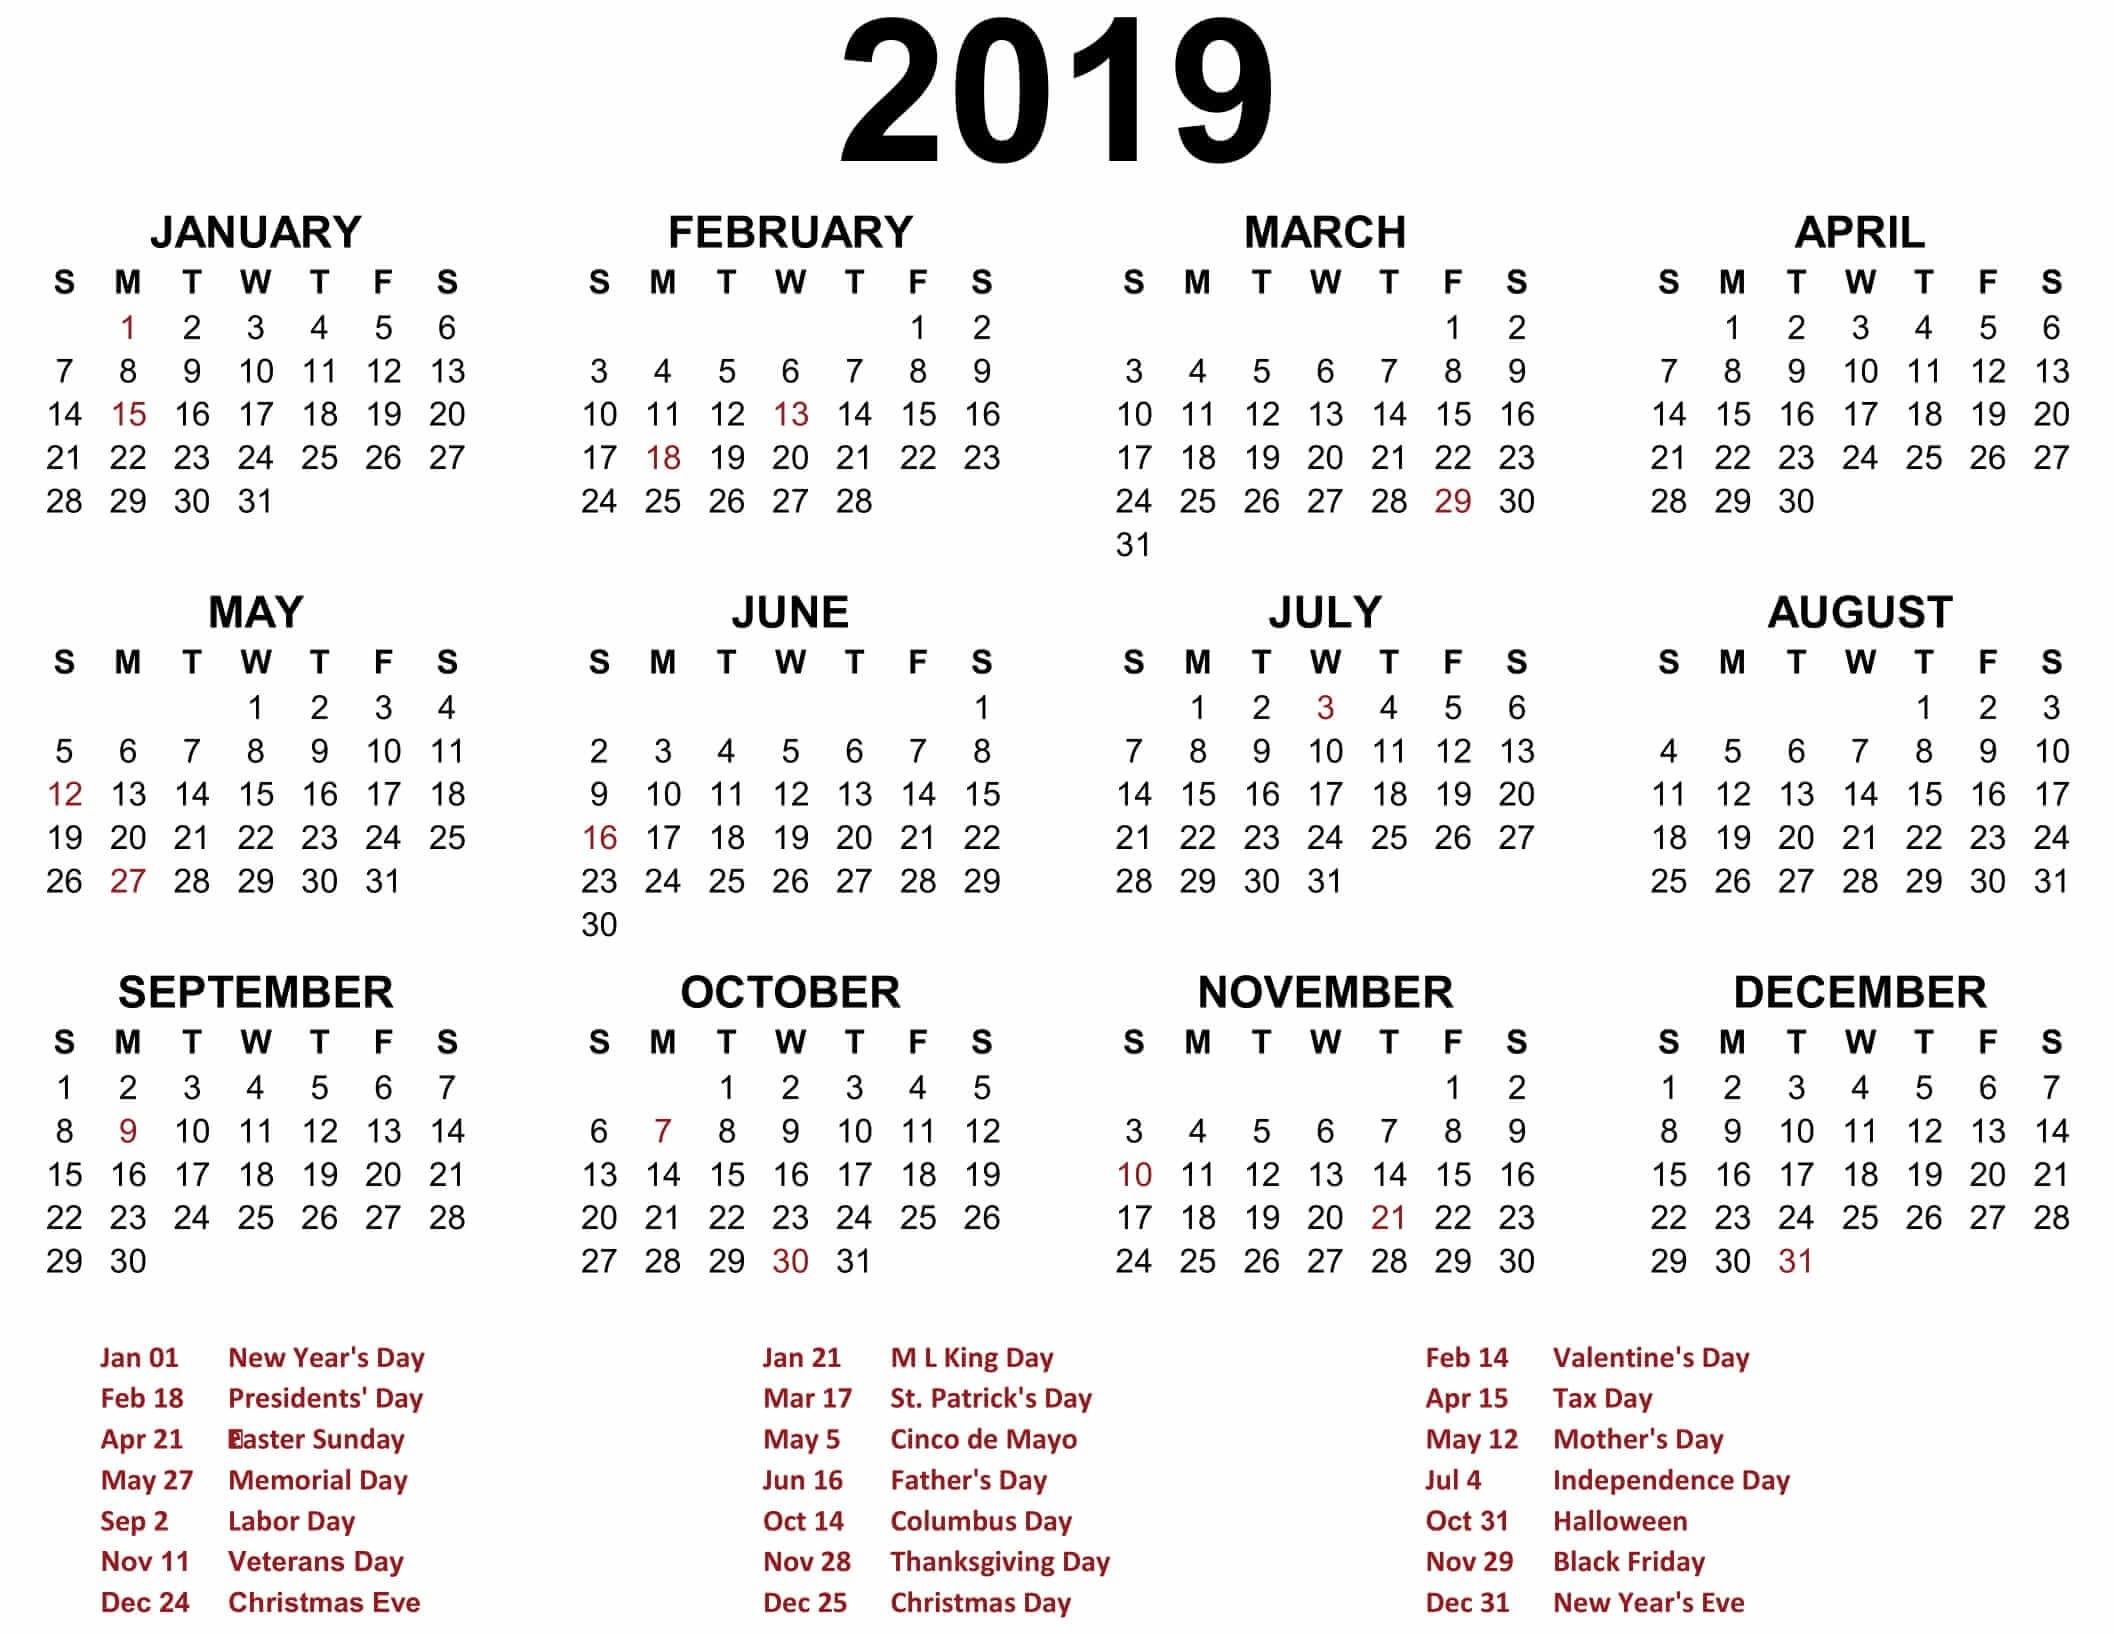 Printable Blank 2019 Calendar Templates – Calenndar 2019 Calendars